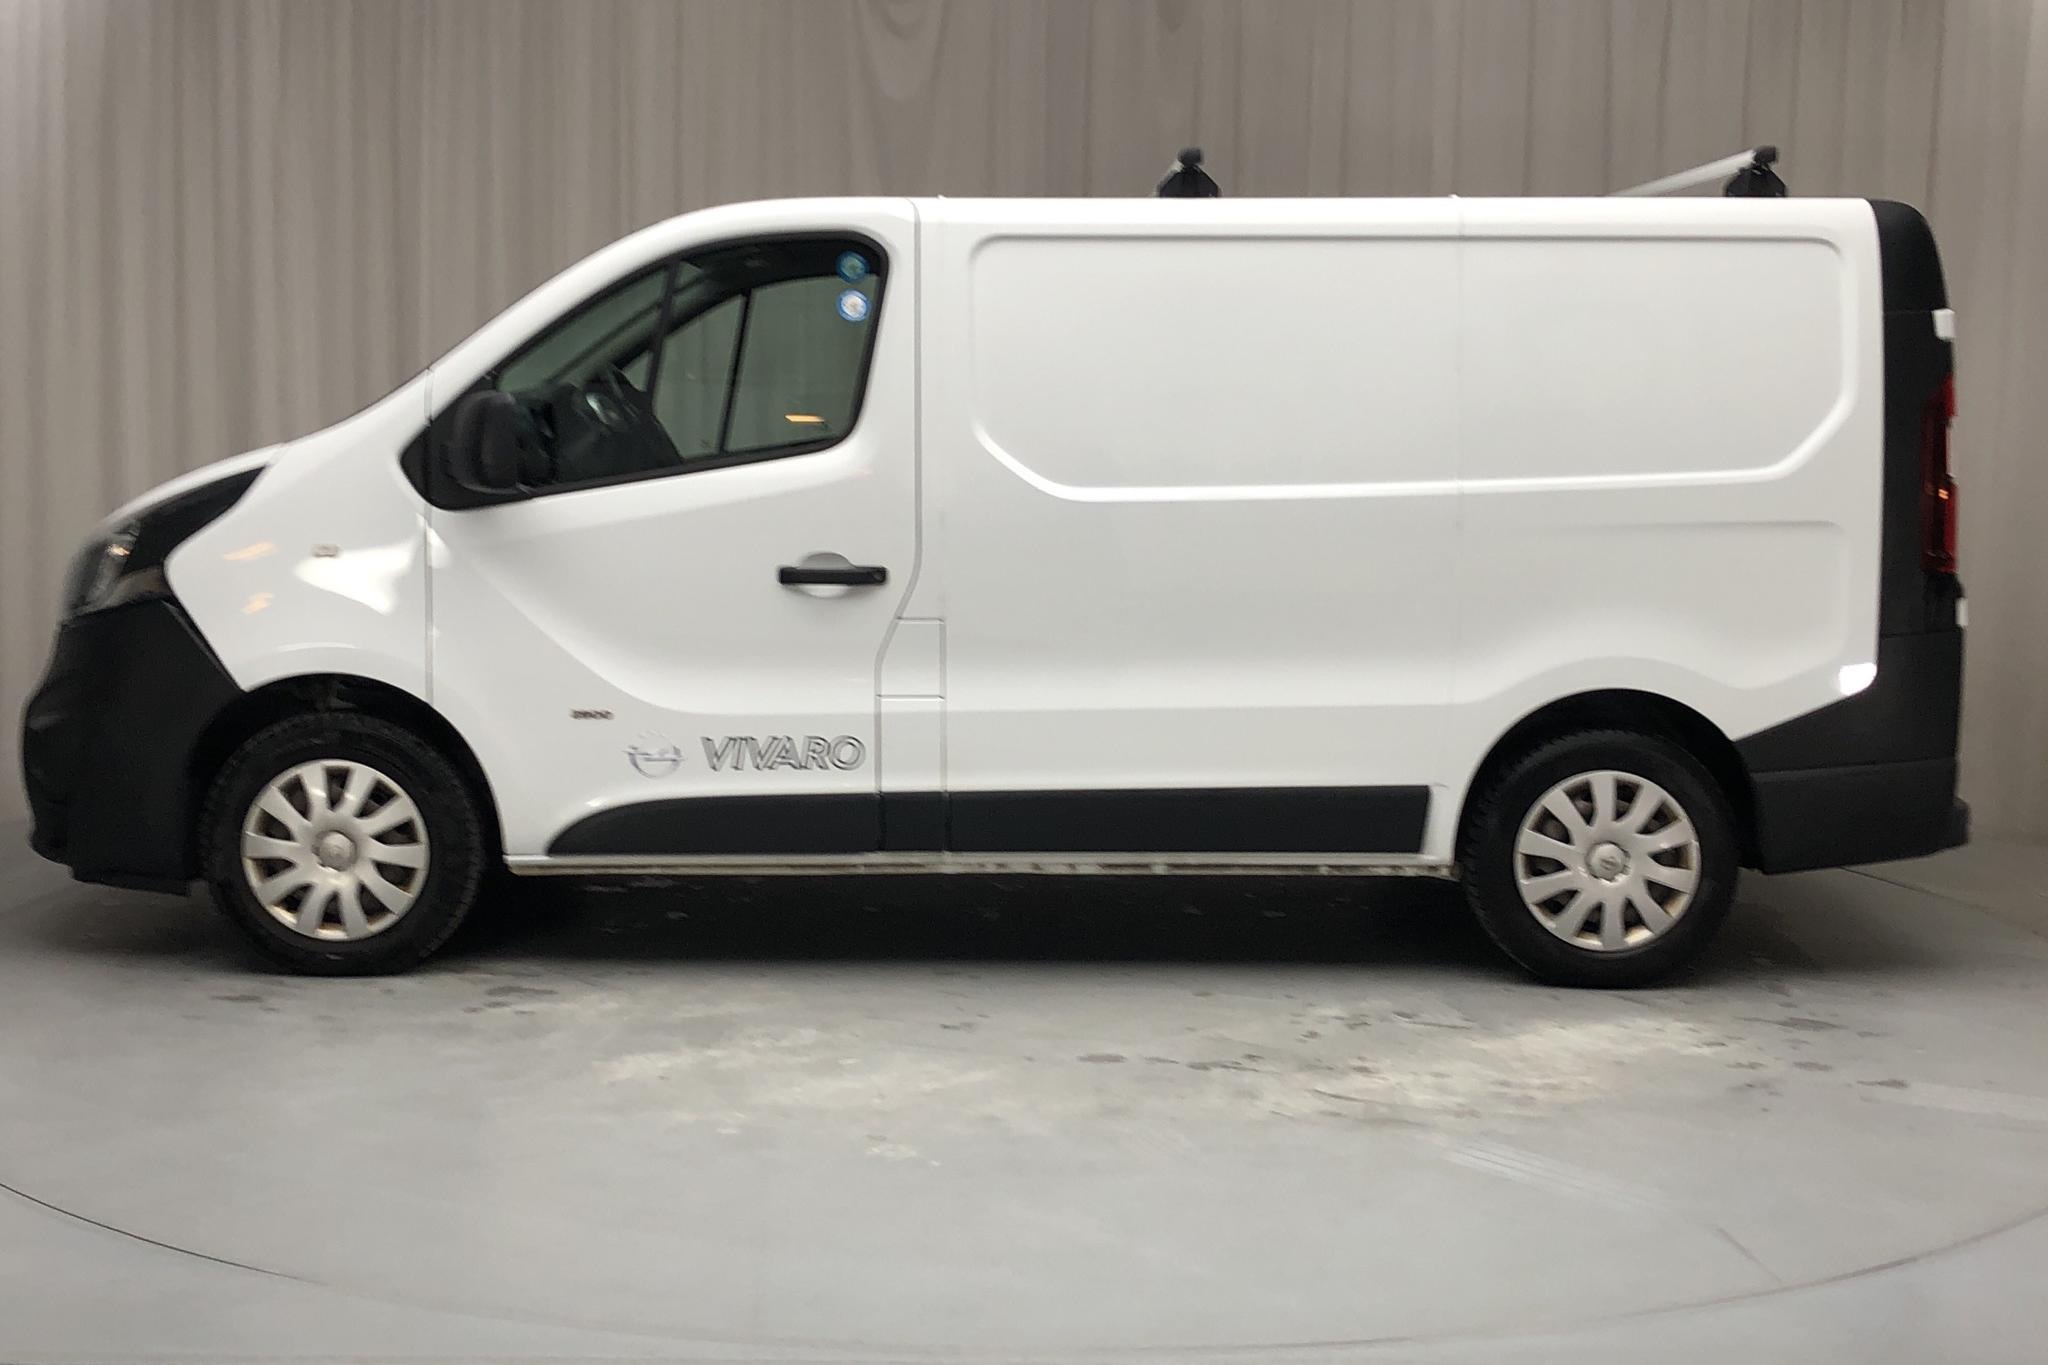 Opel Vivaro 1.6 CDTI (120hk) - 109 860 km - Manual - white - 2015